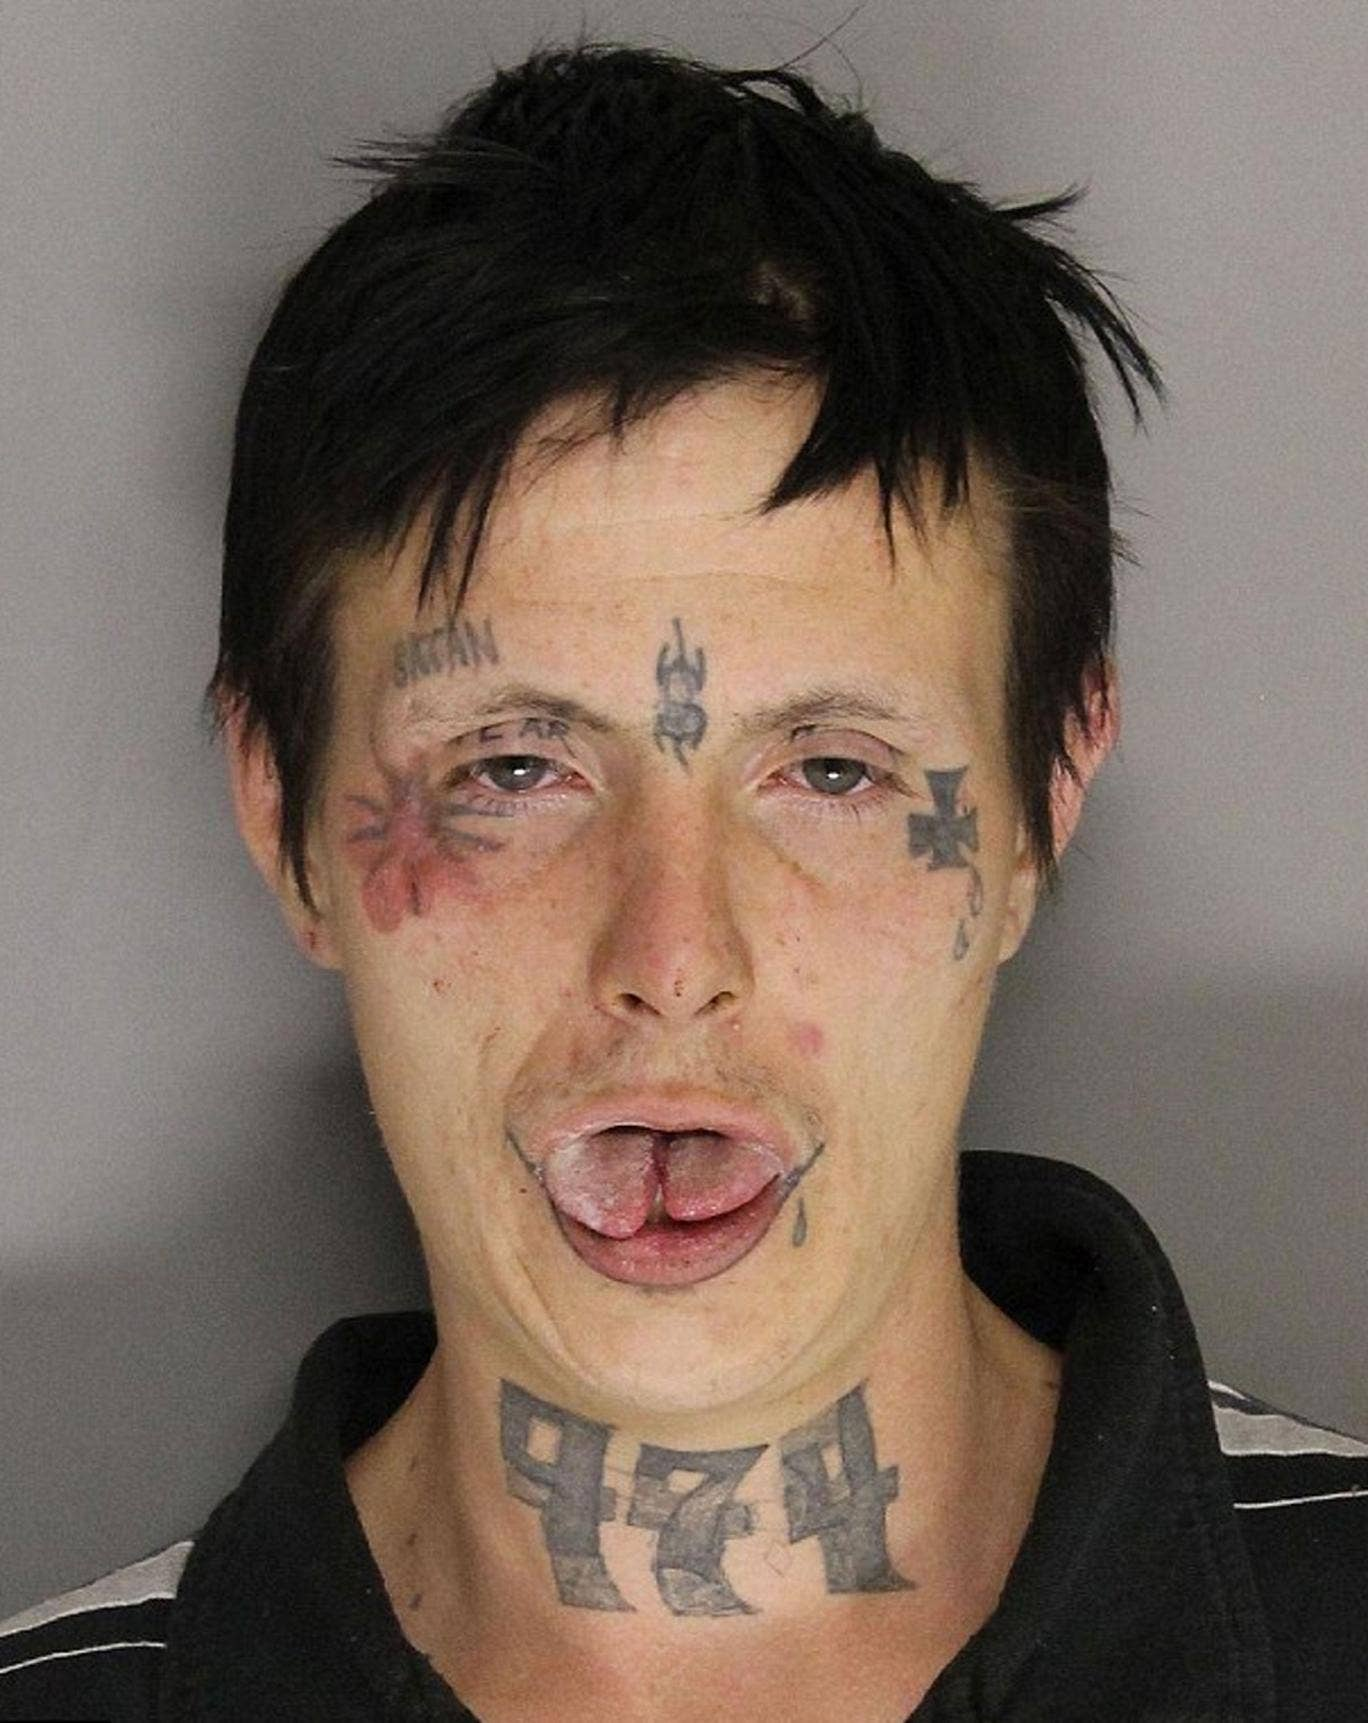 David Adam Pate charged with murdering friend in South Carolina